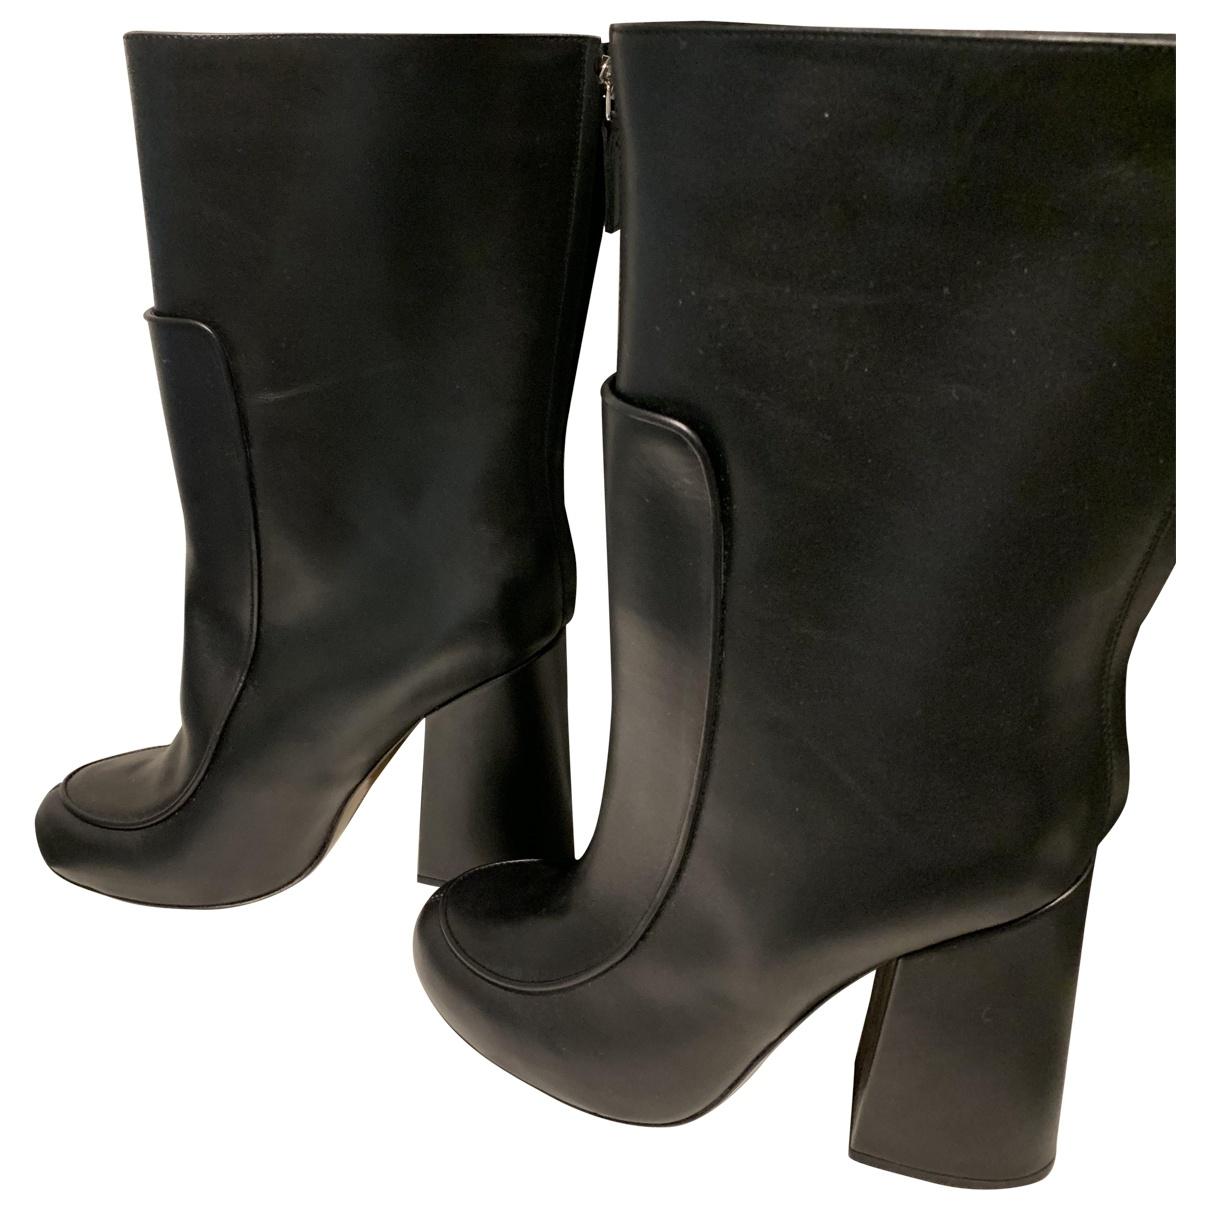 Victoria Beckham \N Black Leather Boots for Women 38 EU